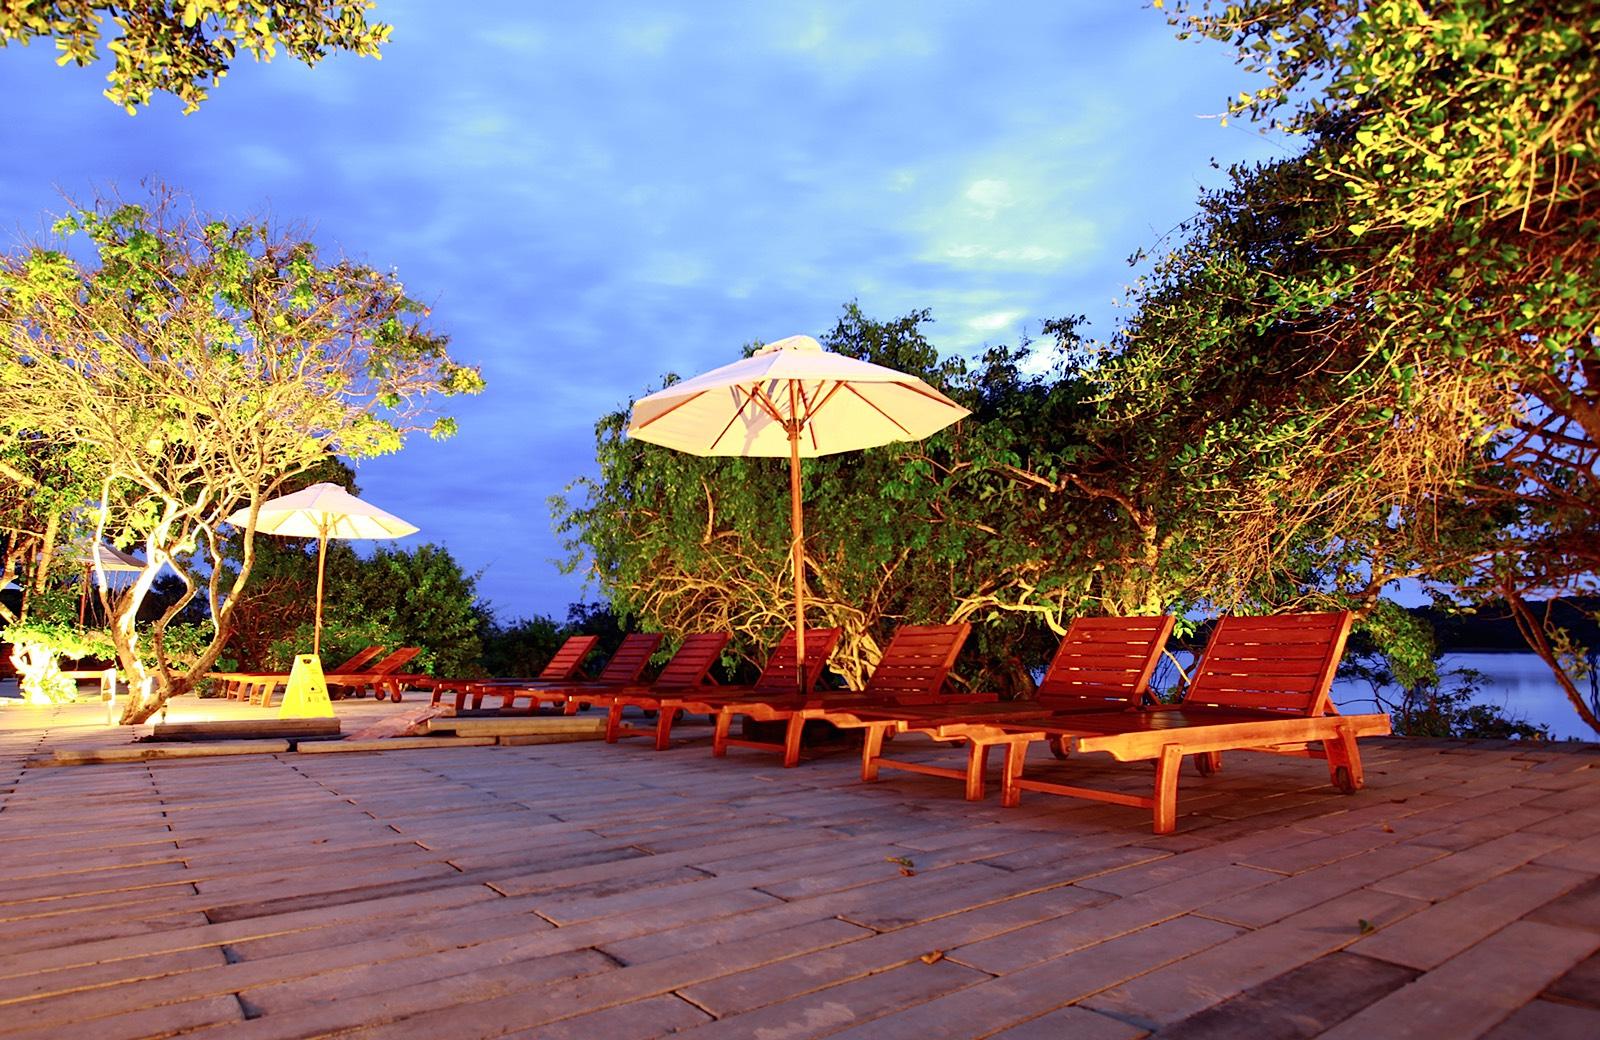 invite-to-paradise-holiday-honeymoon-sri-lanka-specialists-safari-lodge-cinnamon-wild-hotel-3.jpg